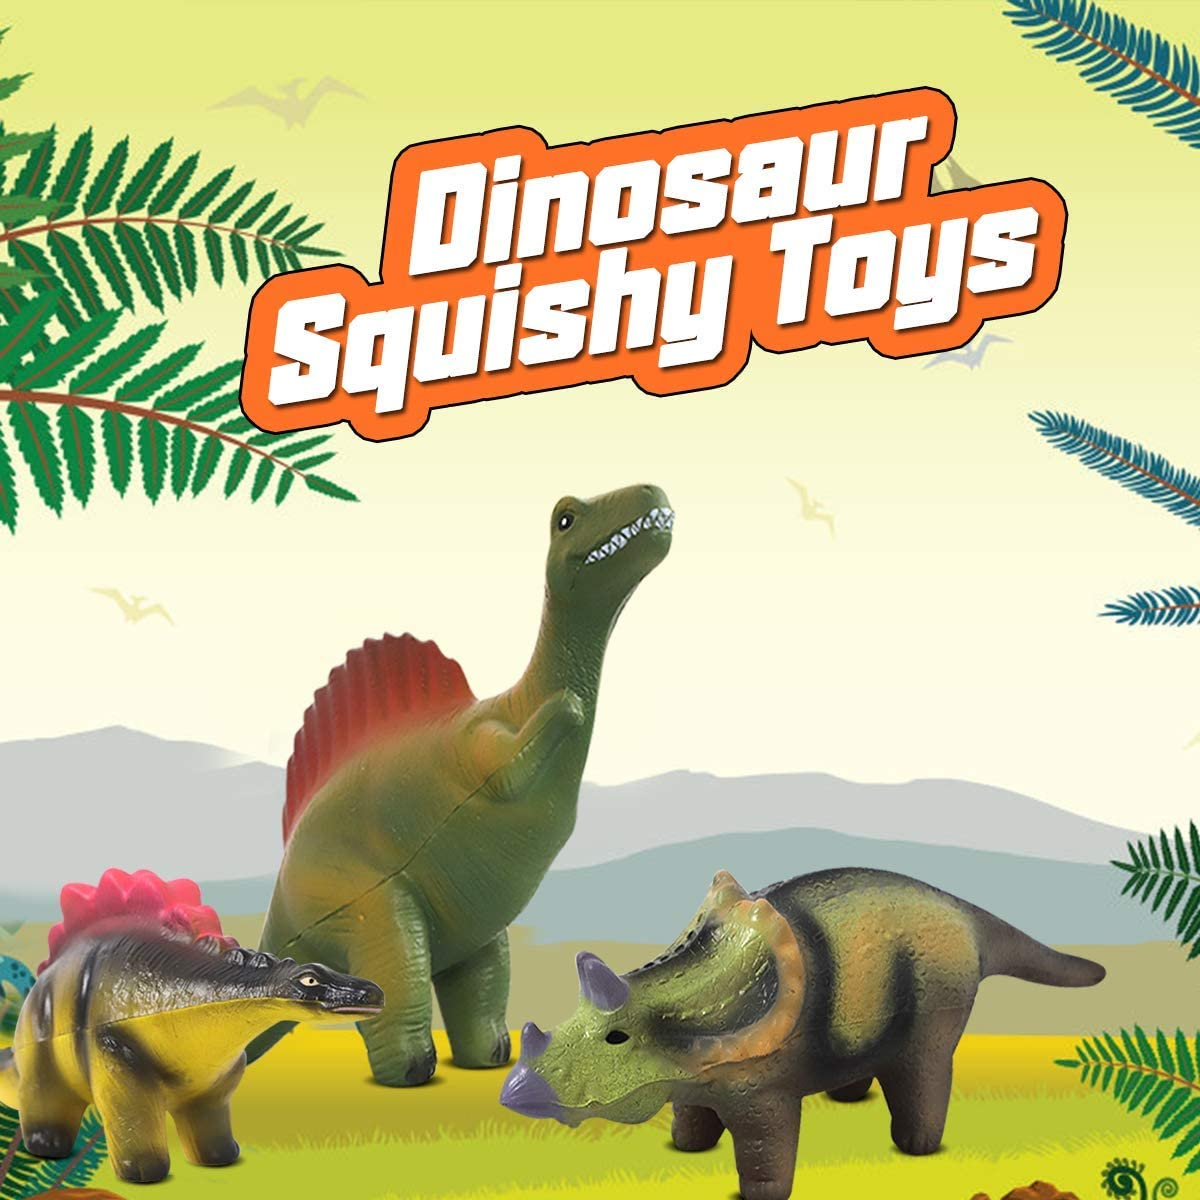 POKONBOY Jumbo Squishies Dinosaur Squishy Toys 6 Pack Dinosaur Toys for Boys Squishies Scented Squishies Pack Dinosaur Party Favors Squishies Stress Relief Toys for Dinosaur Party Supplies